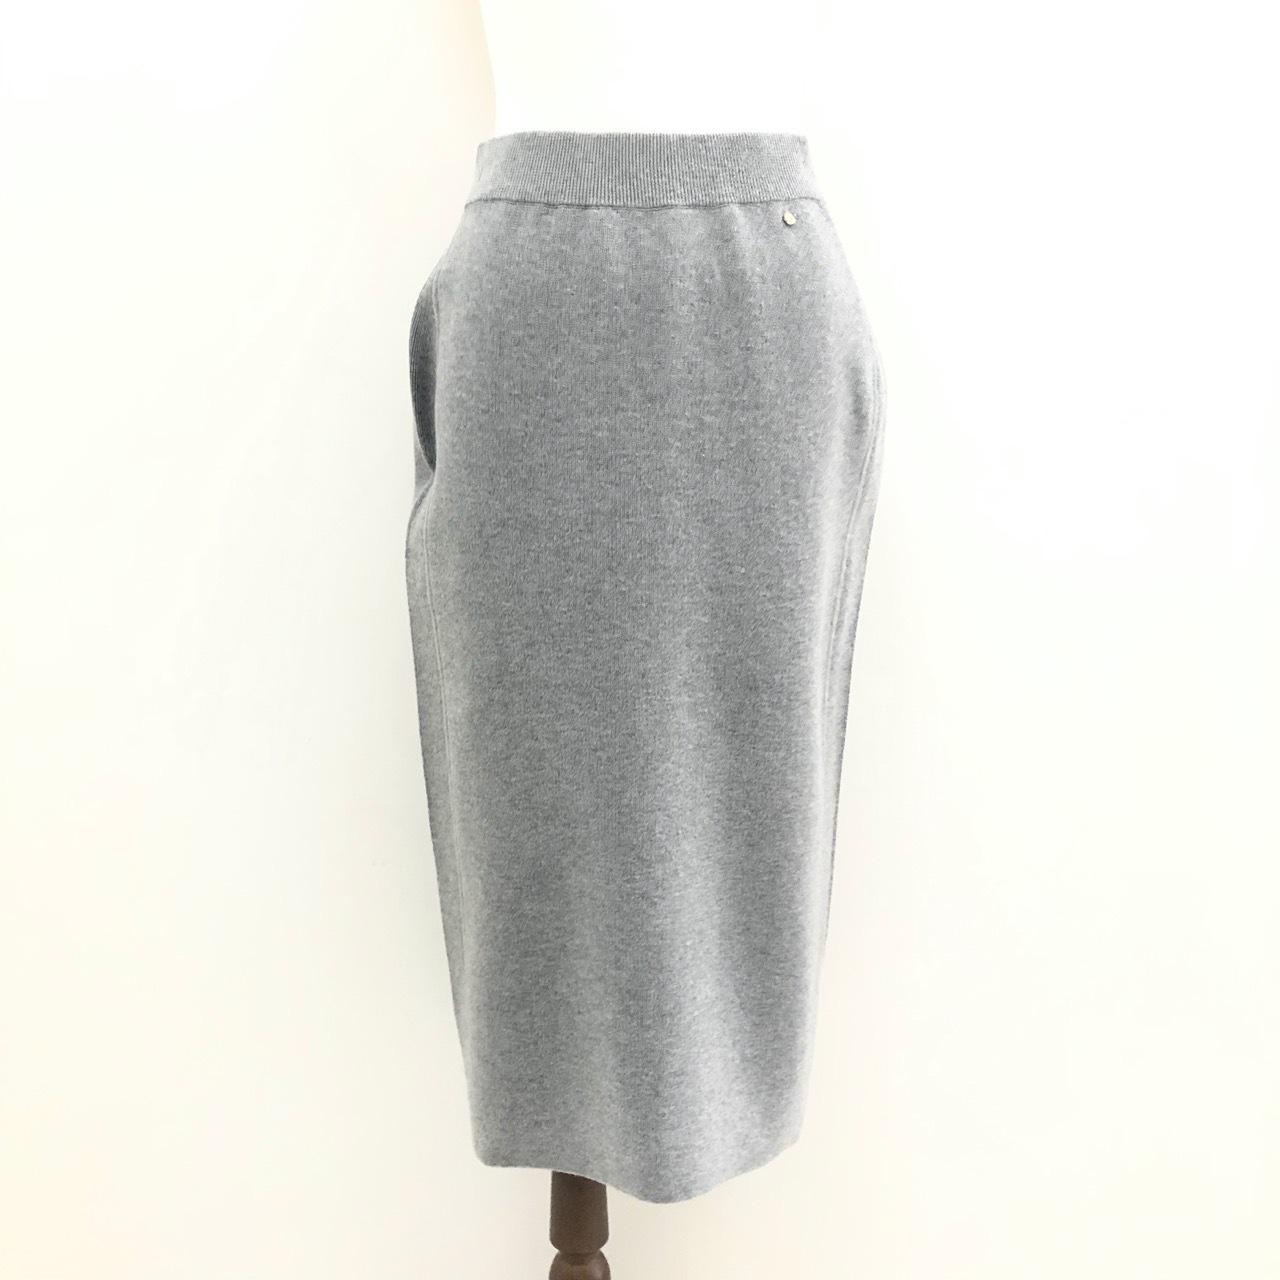 【 QTUME 】- 062-26510 - ボンディングスカート